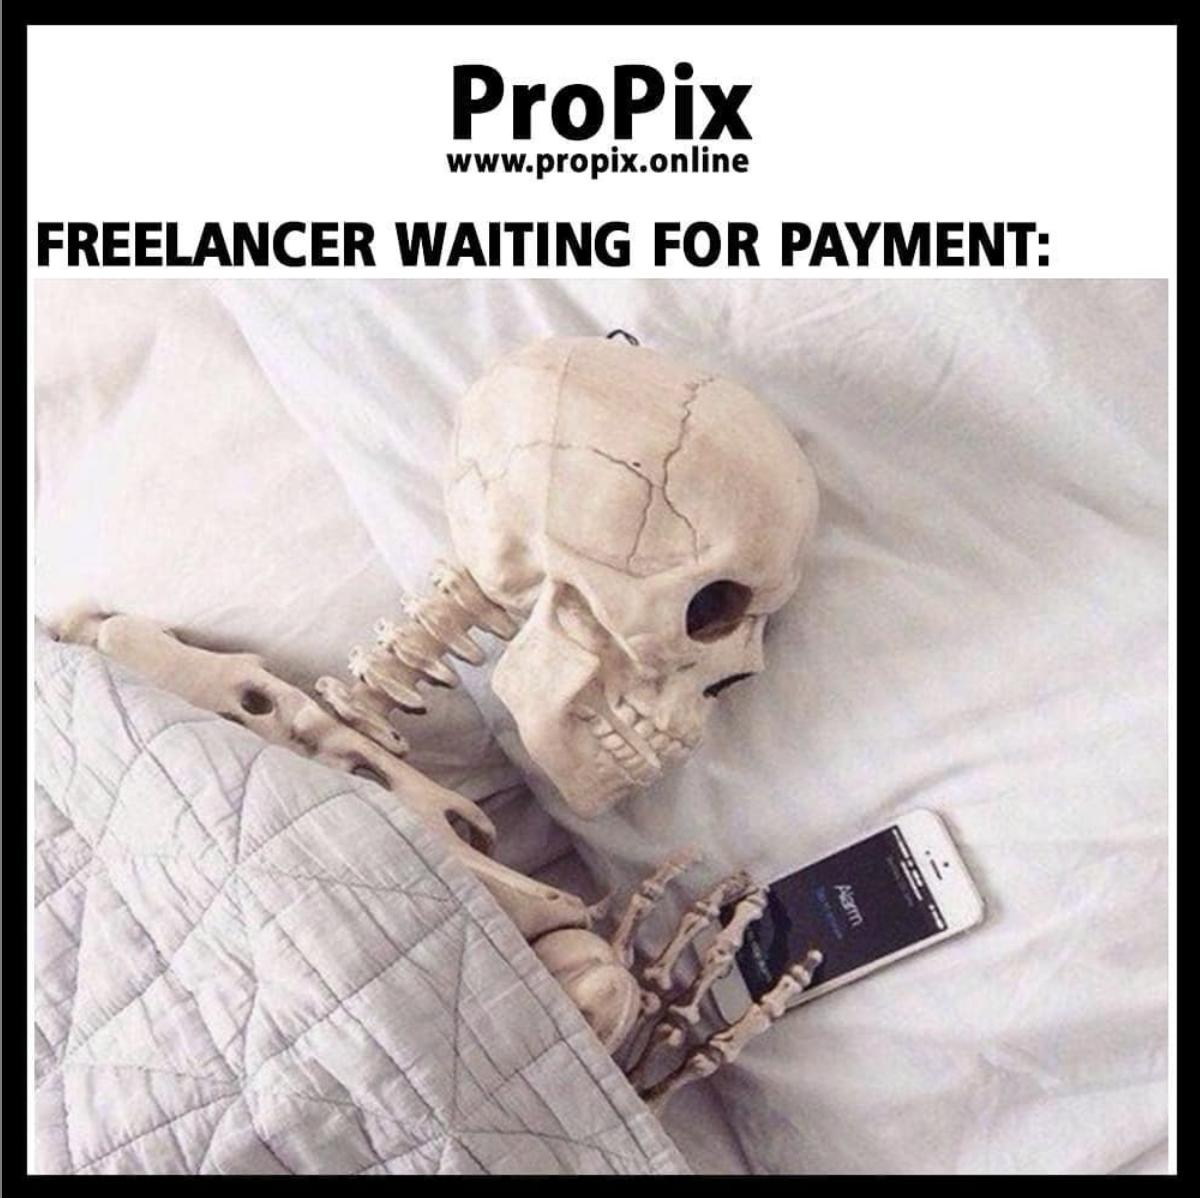 A freelancer still waiting to get paid